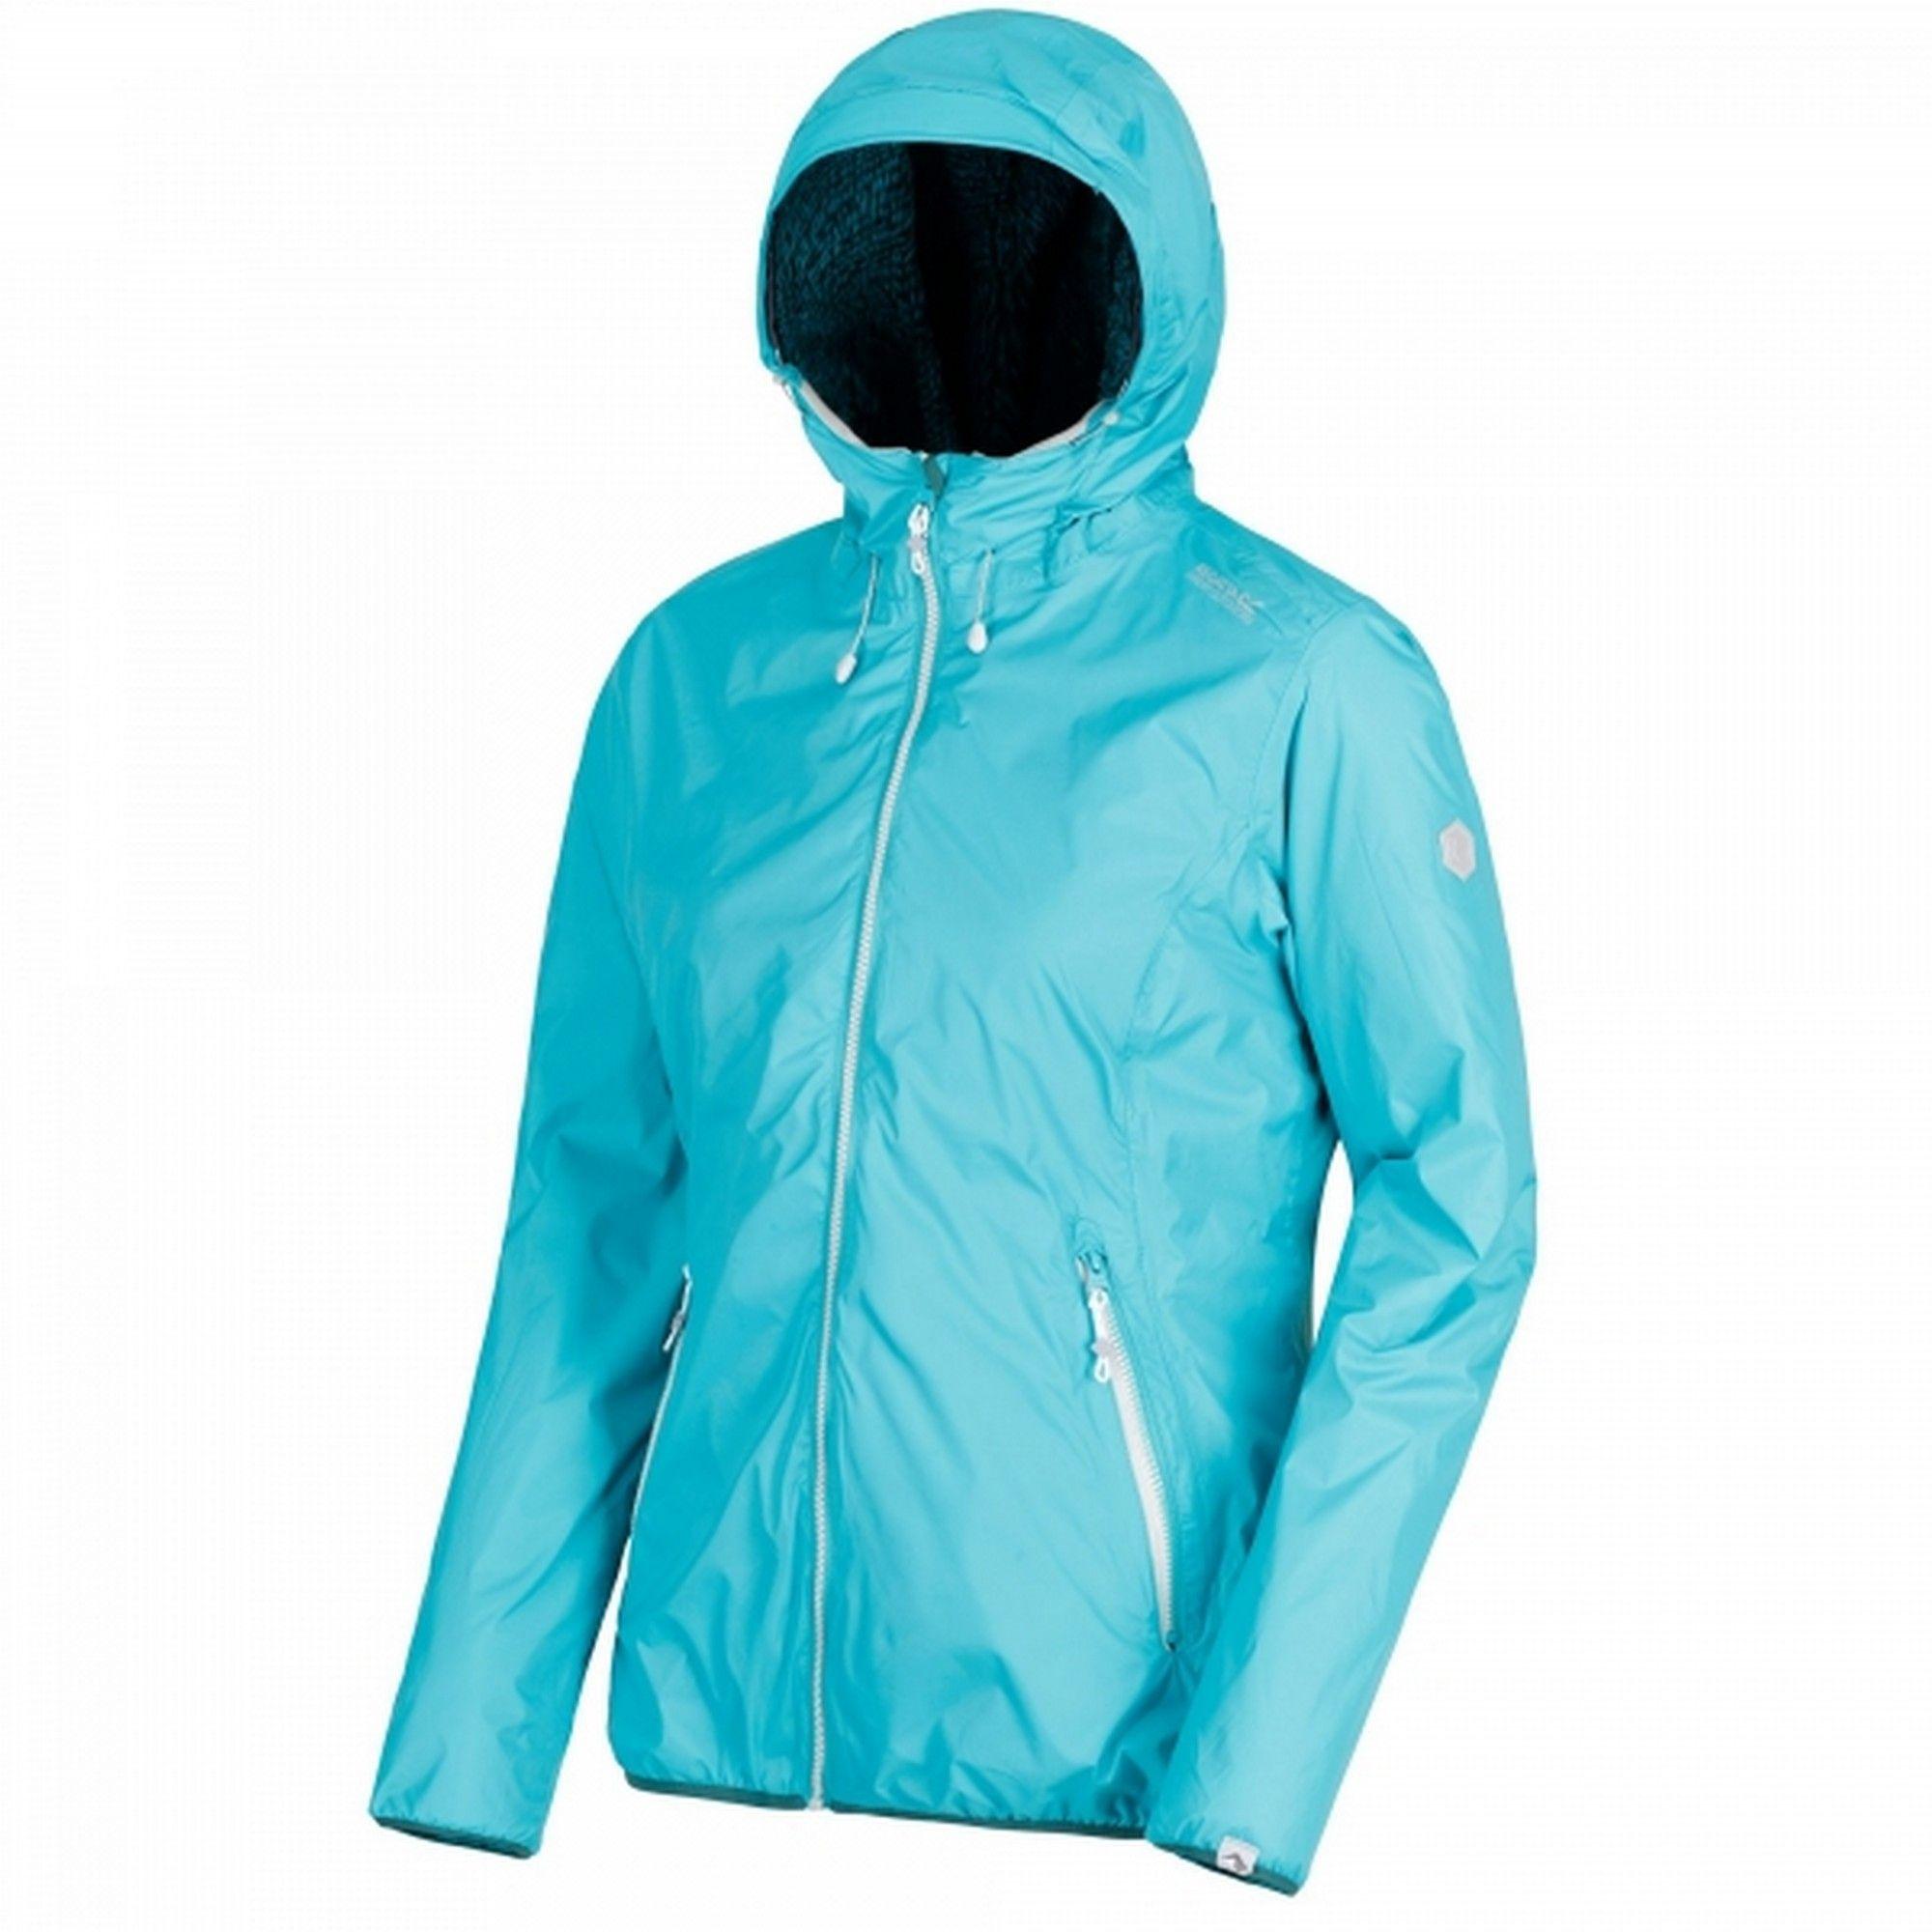 Regatta Womens/Ladies Tarren Hooded Jacket